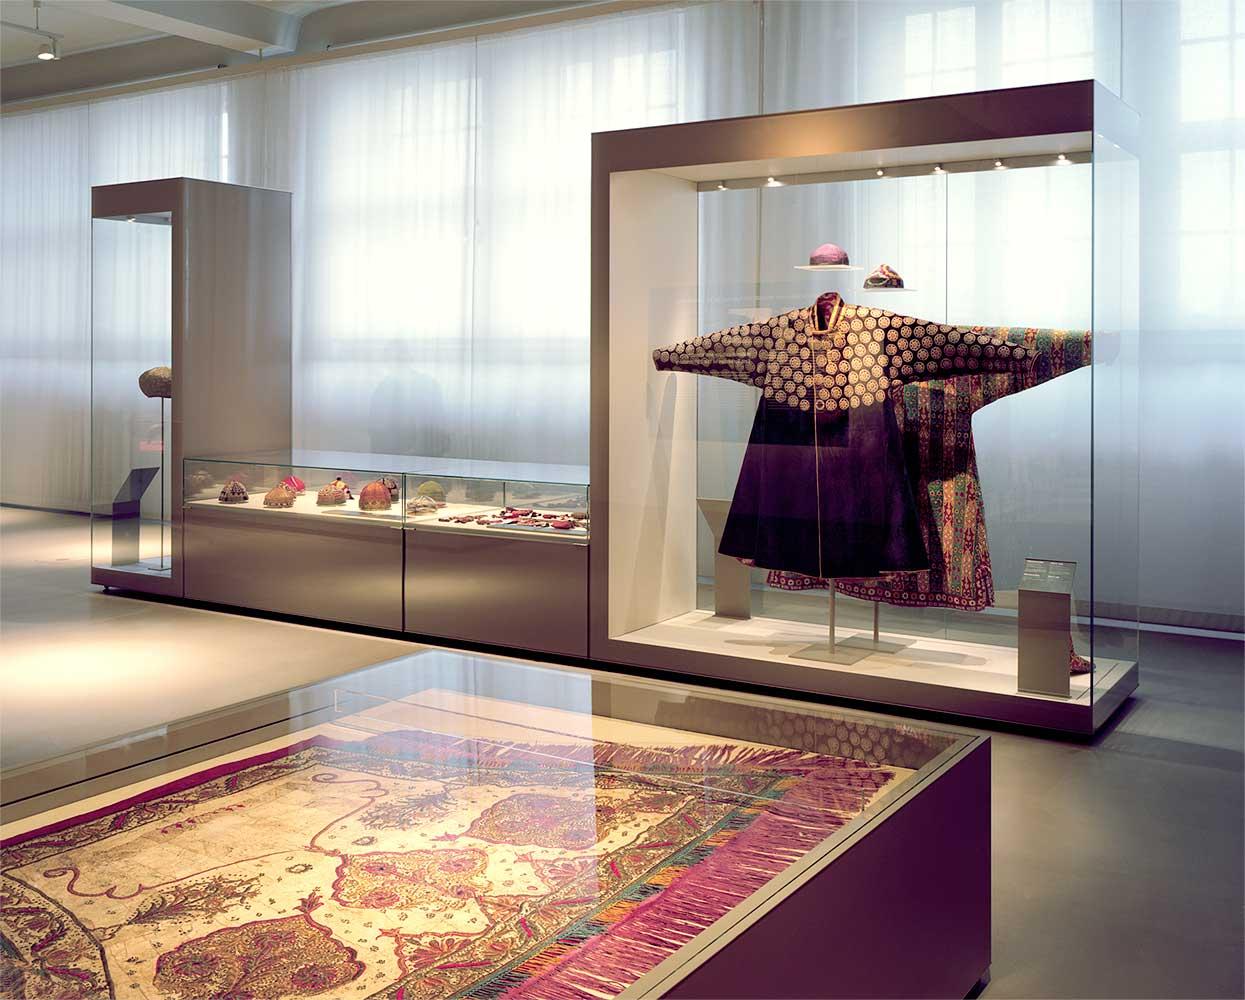 Ethnologisches Museum, Museum der Europäischen Kulturen, Berlin